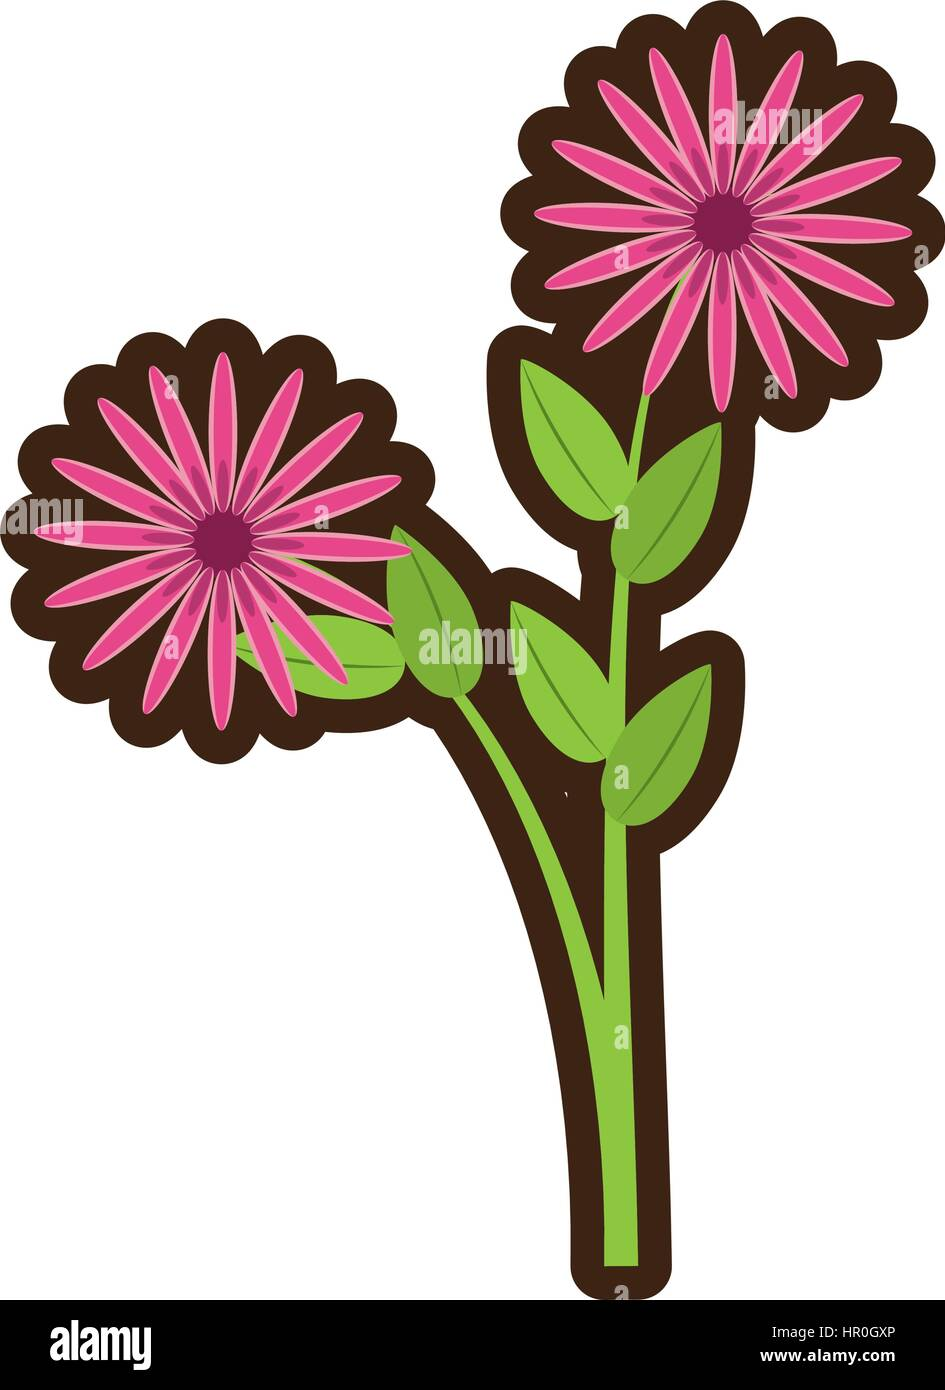 Cartoon daisy flowers bunch flora stock vector art illustration cartoon daisy flowers bunch flora izmirmasajfo